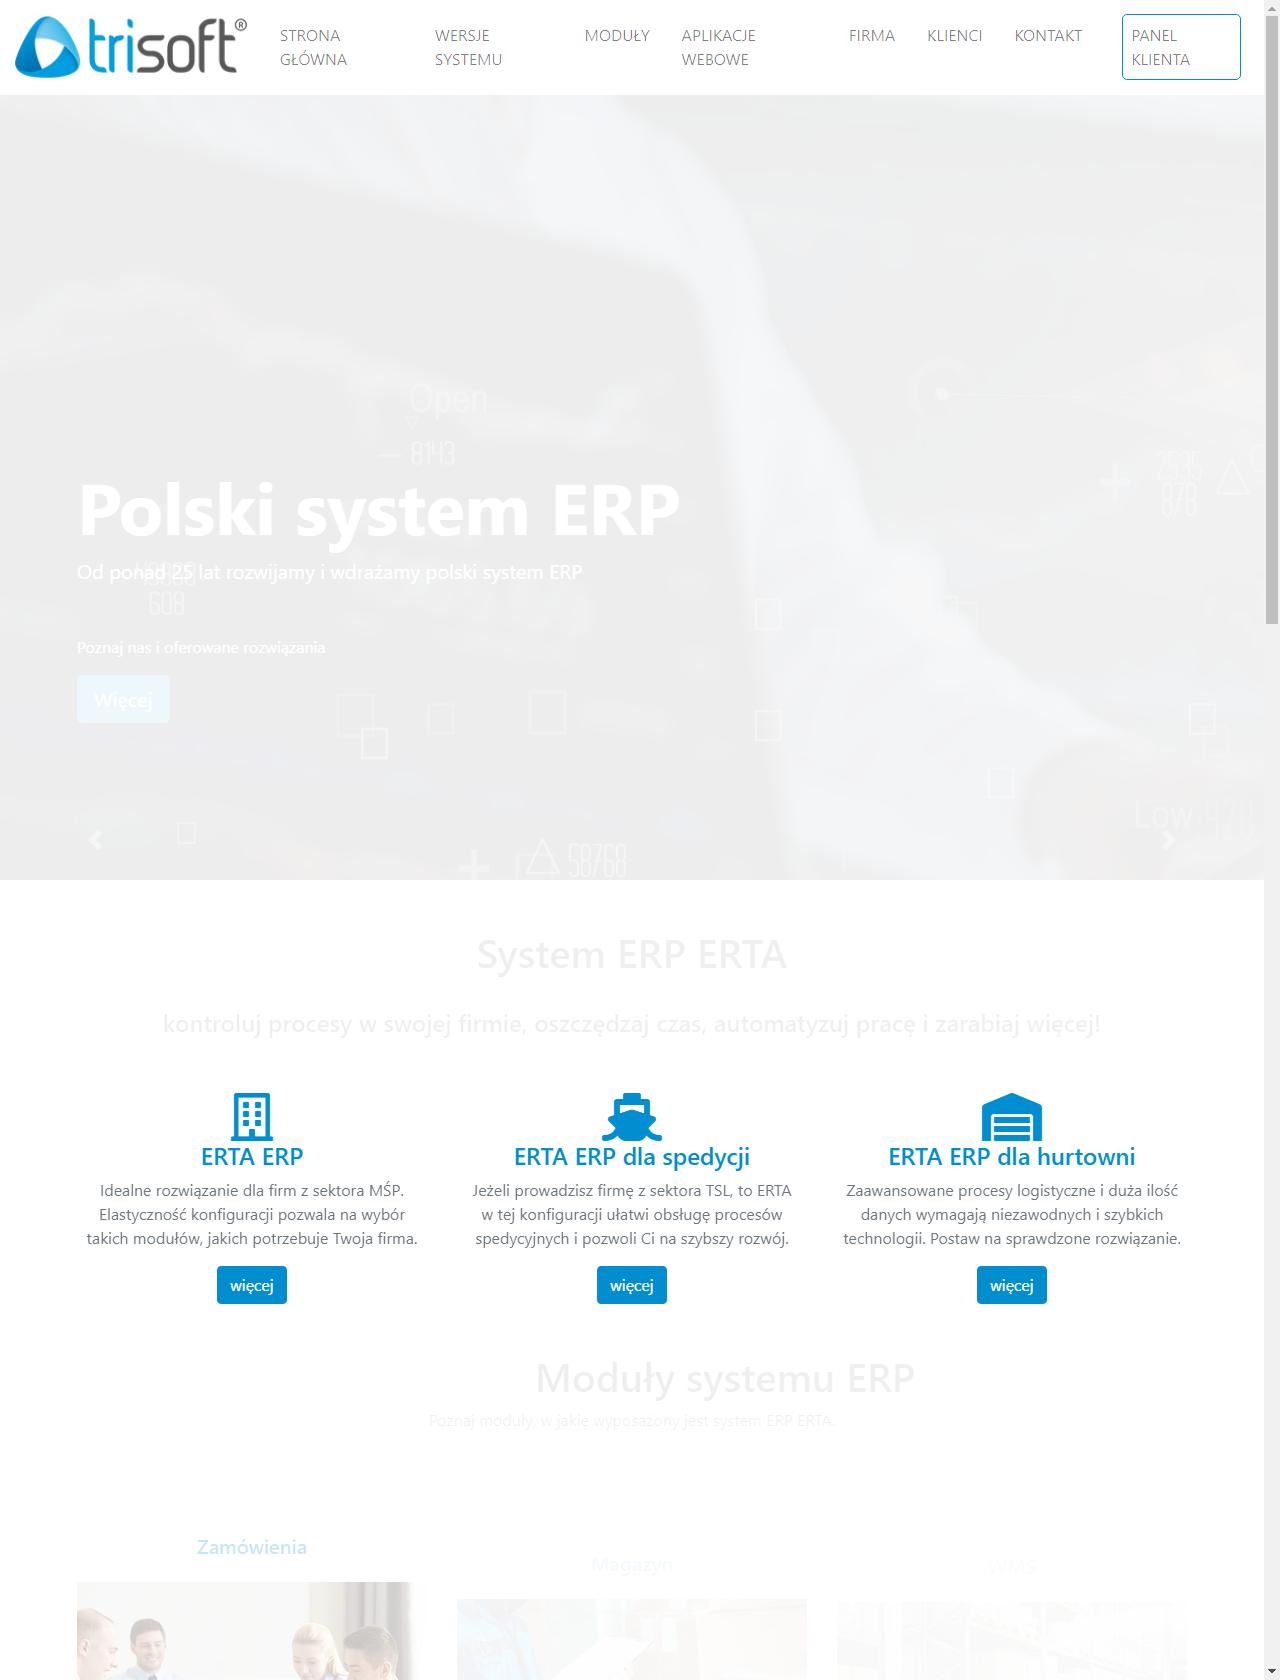 Screenshot Desktop - https://www.trisoft.com.pl/